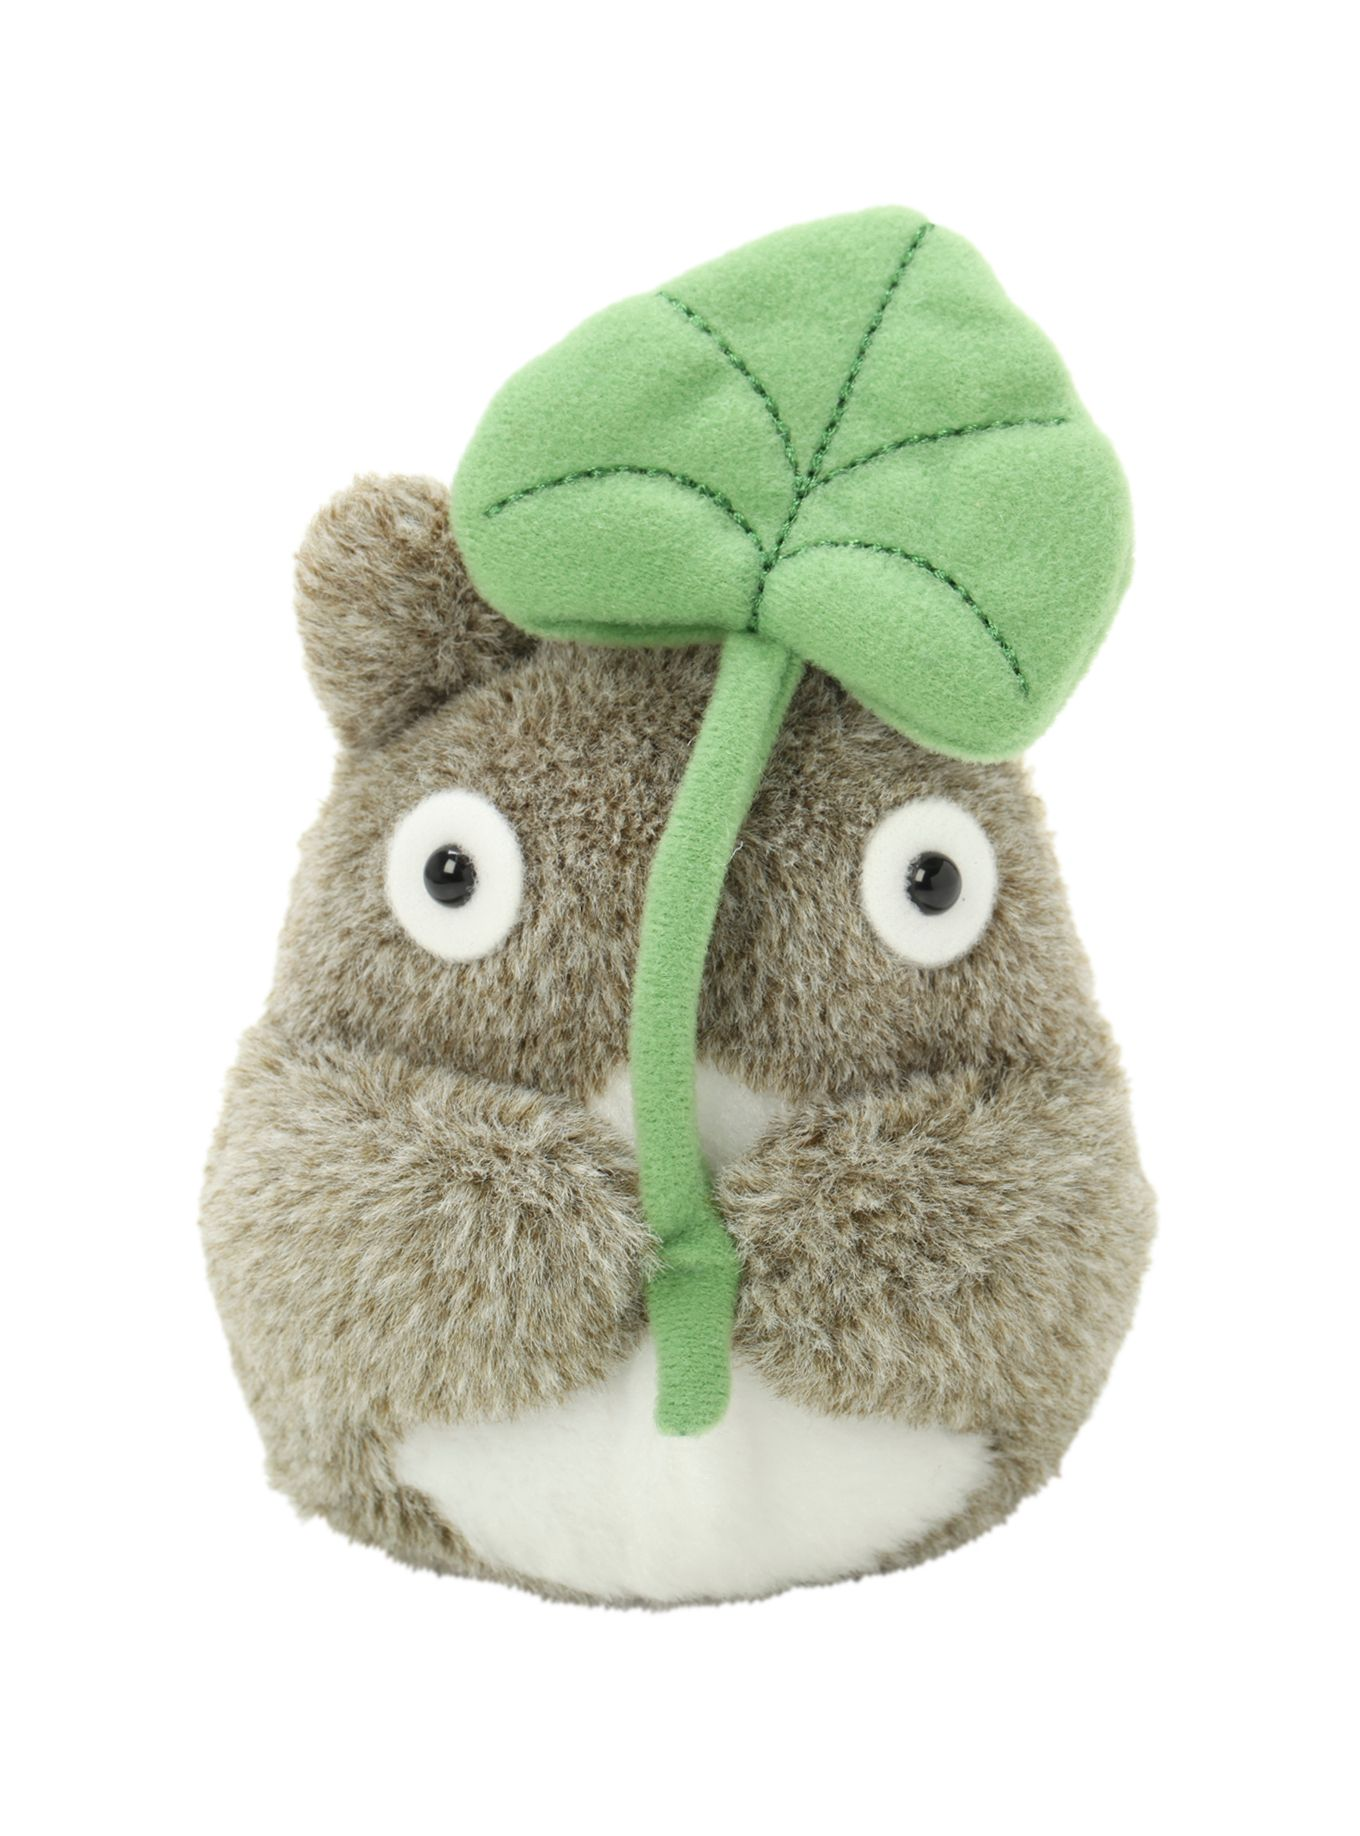 Studio Ghibli My Neighbor Totoro 6 Quot Leaf Totoro Plush